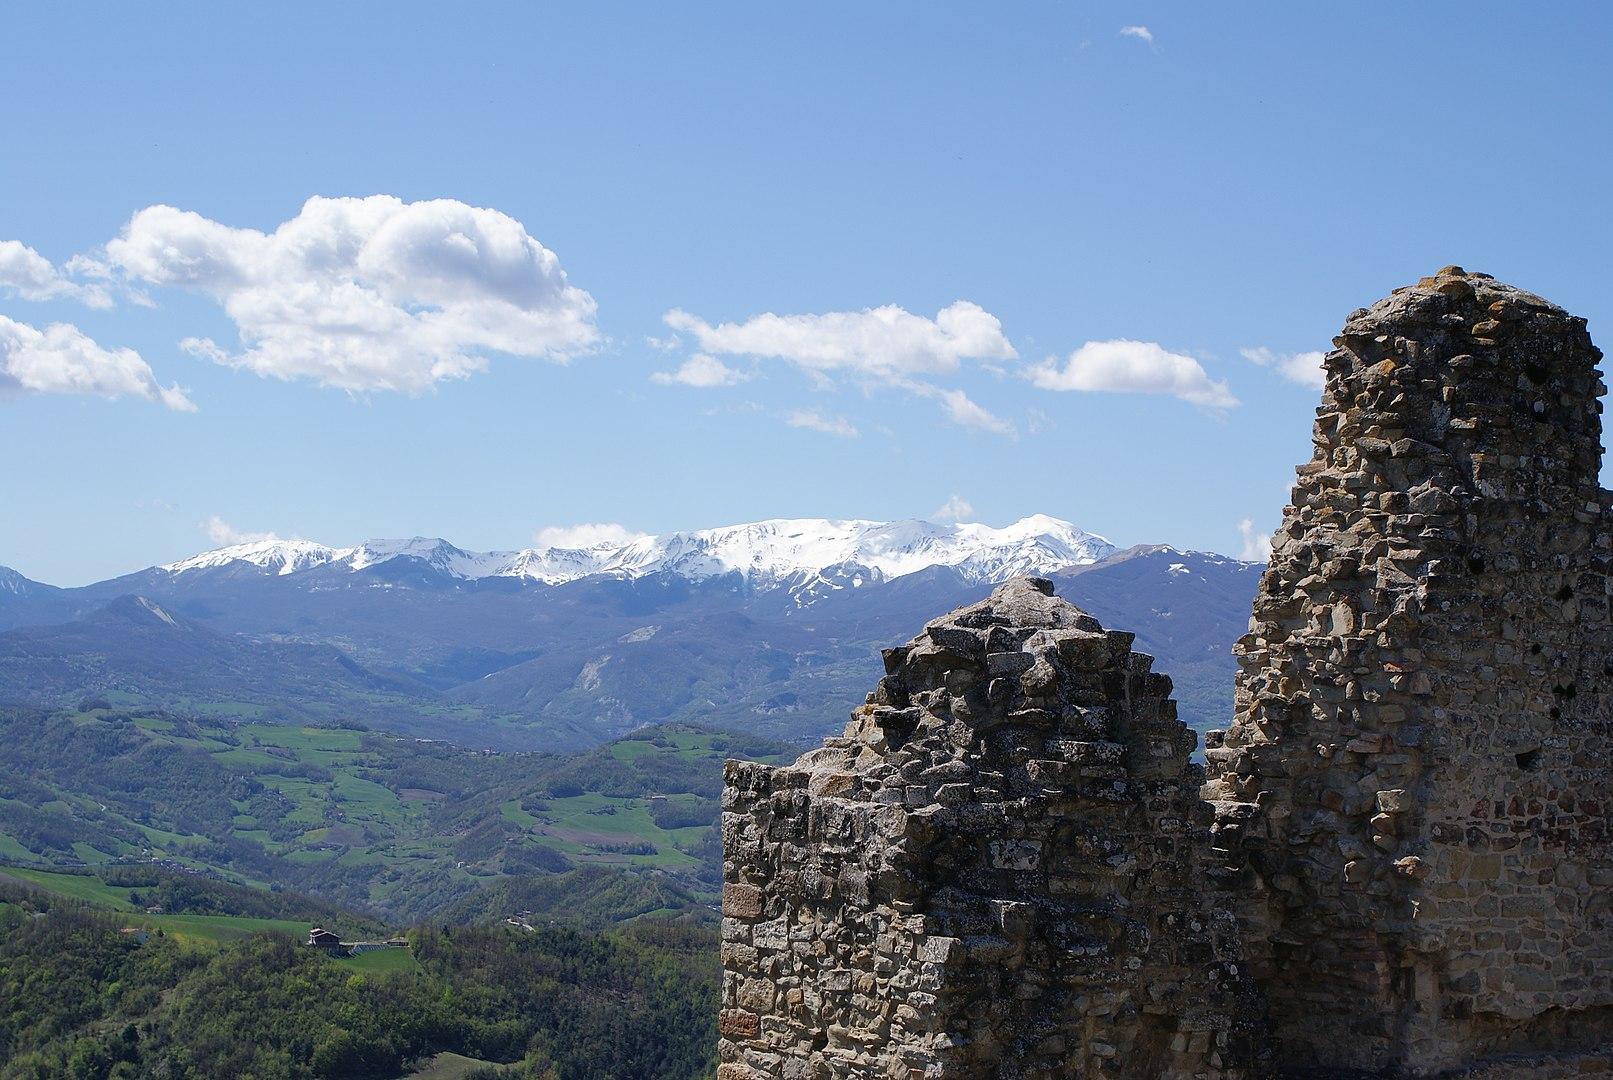 Cusna Mount seen from Carpineti Castle | Ph. Paolo Picciati